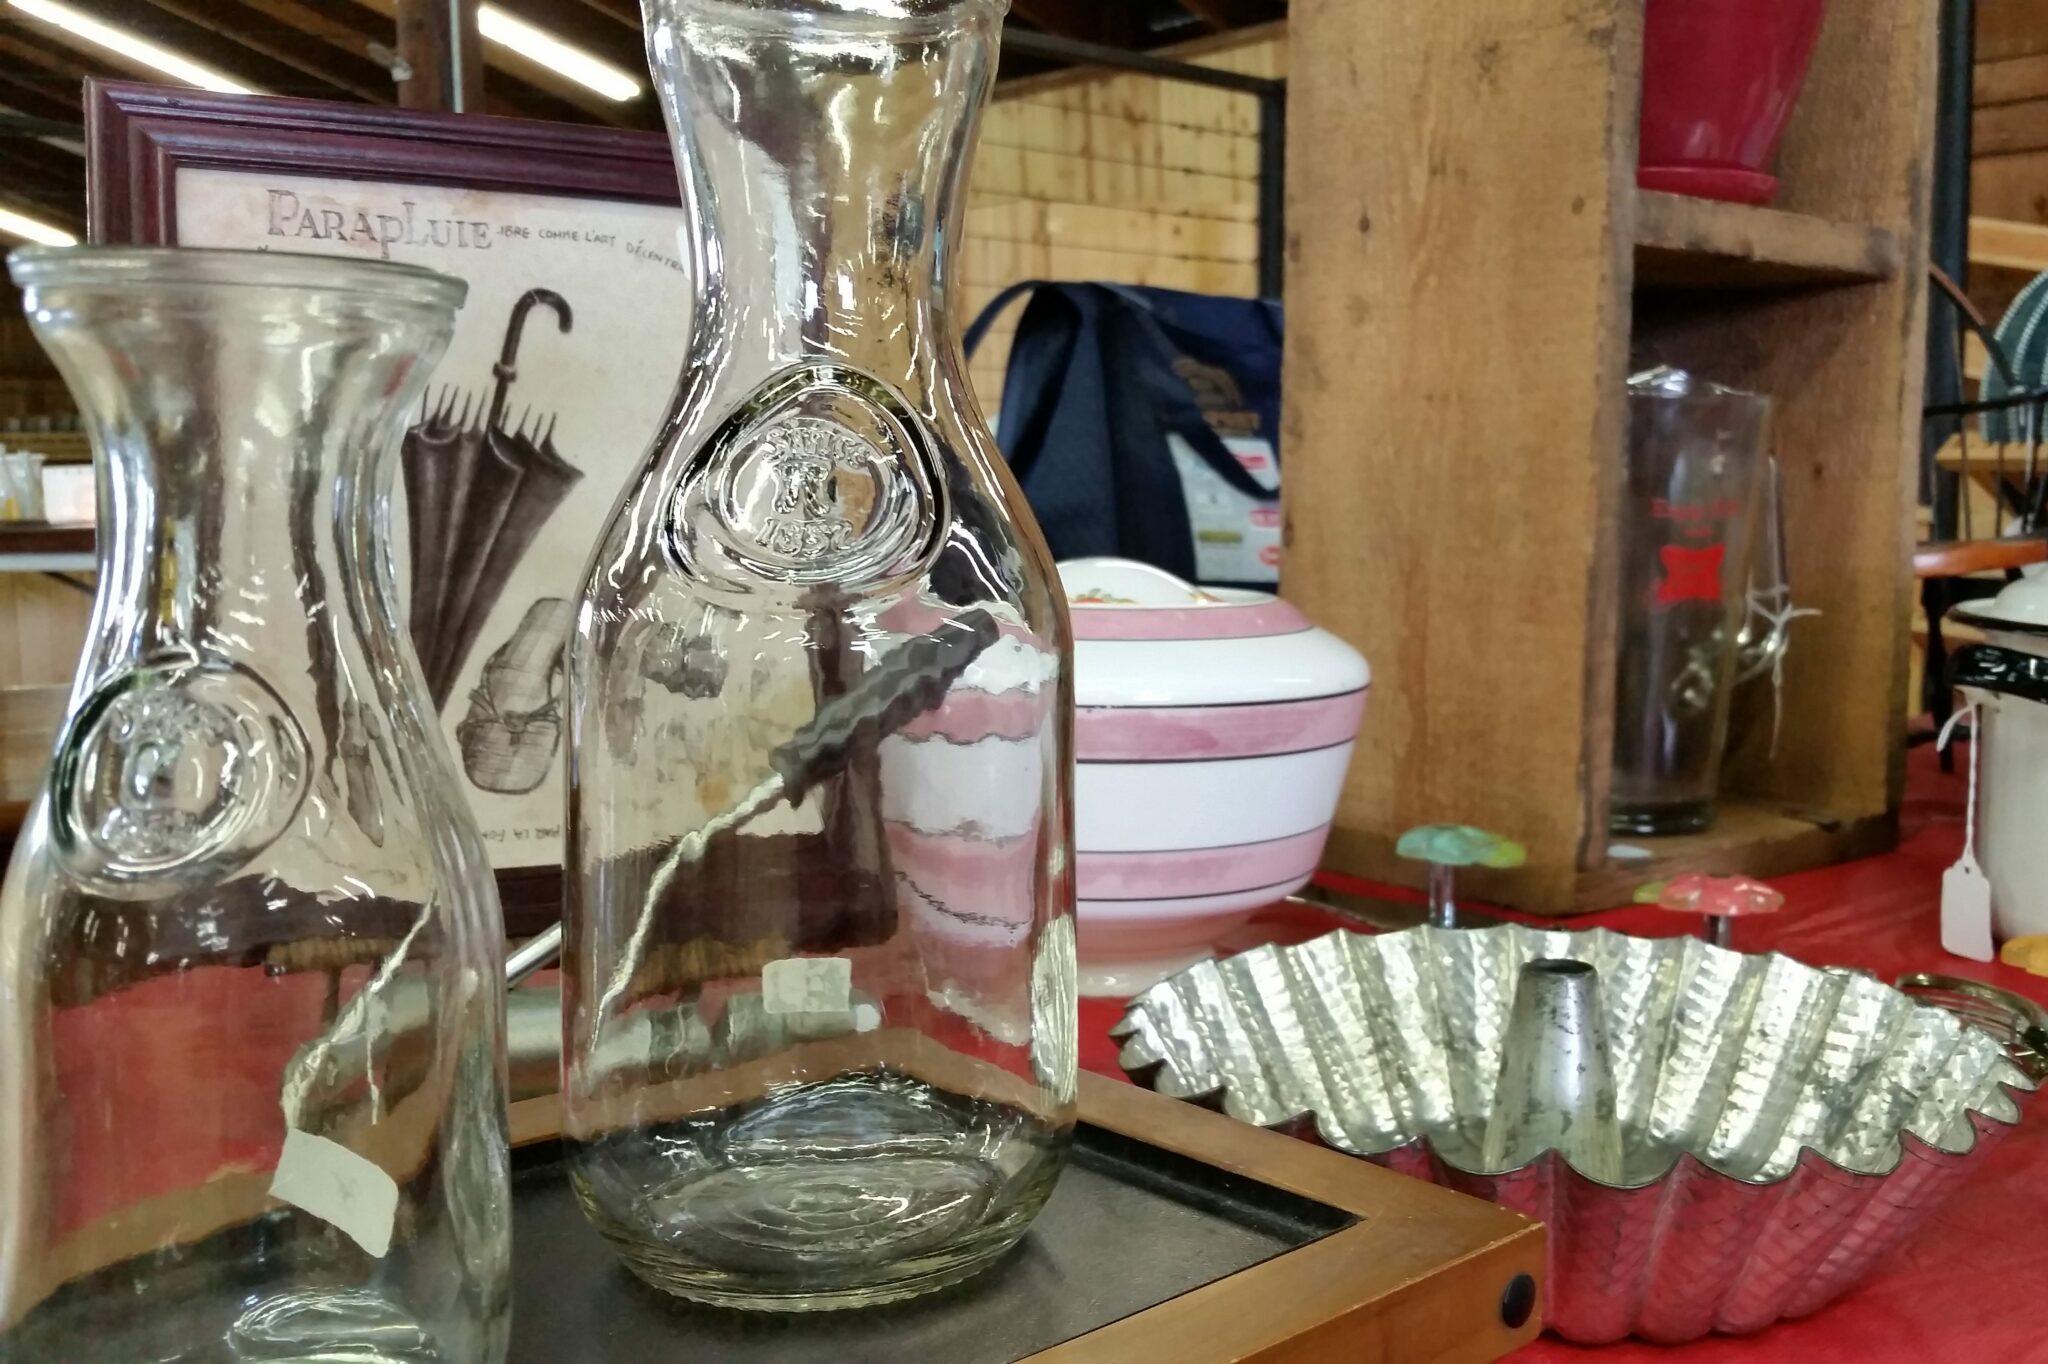 Glass Milk and Kitchen Wares at Flea Market